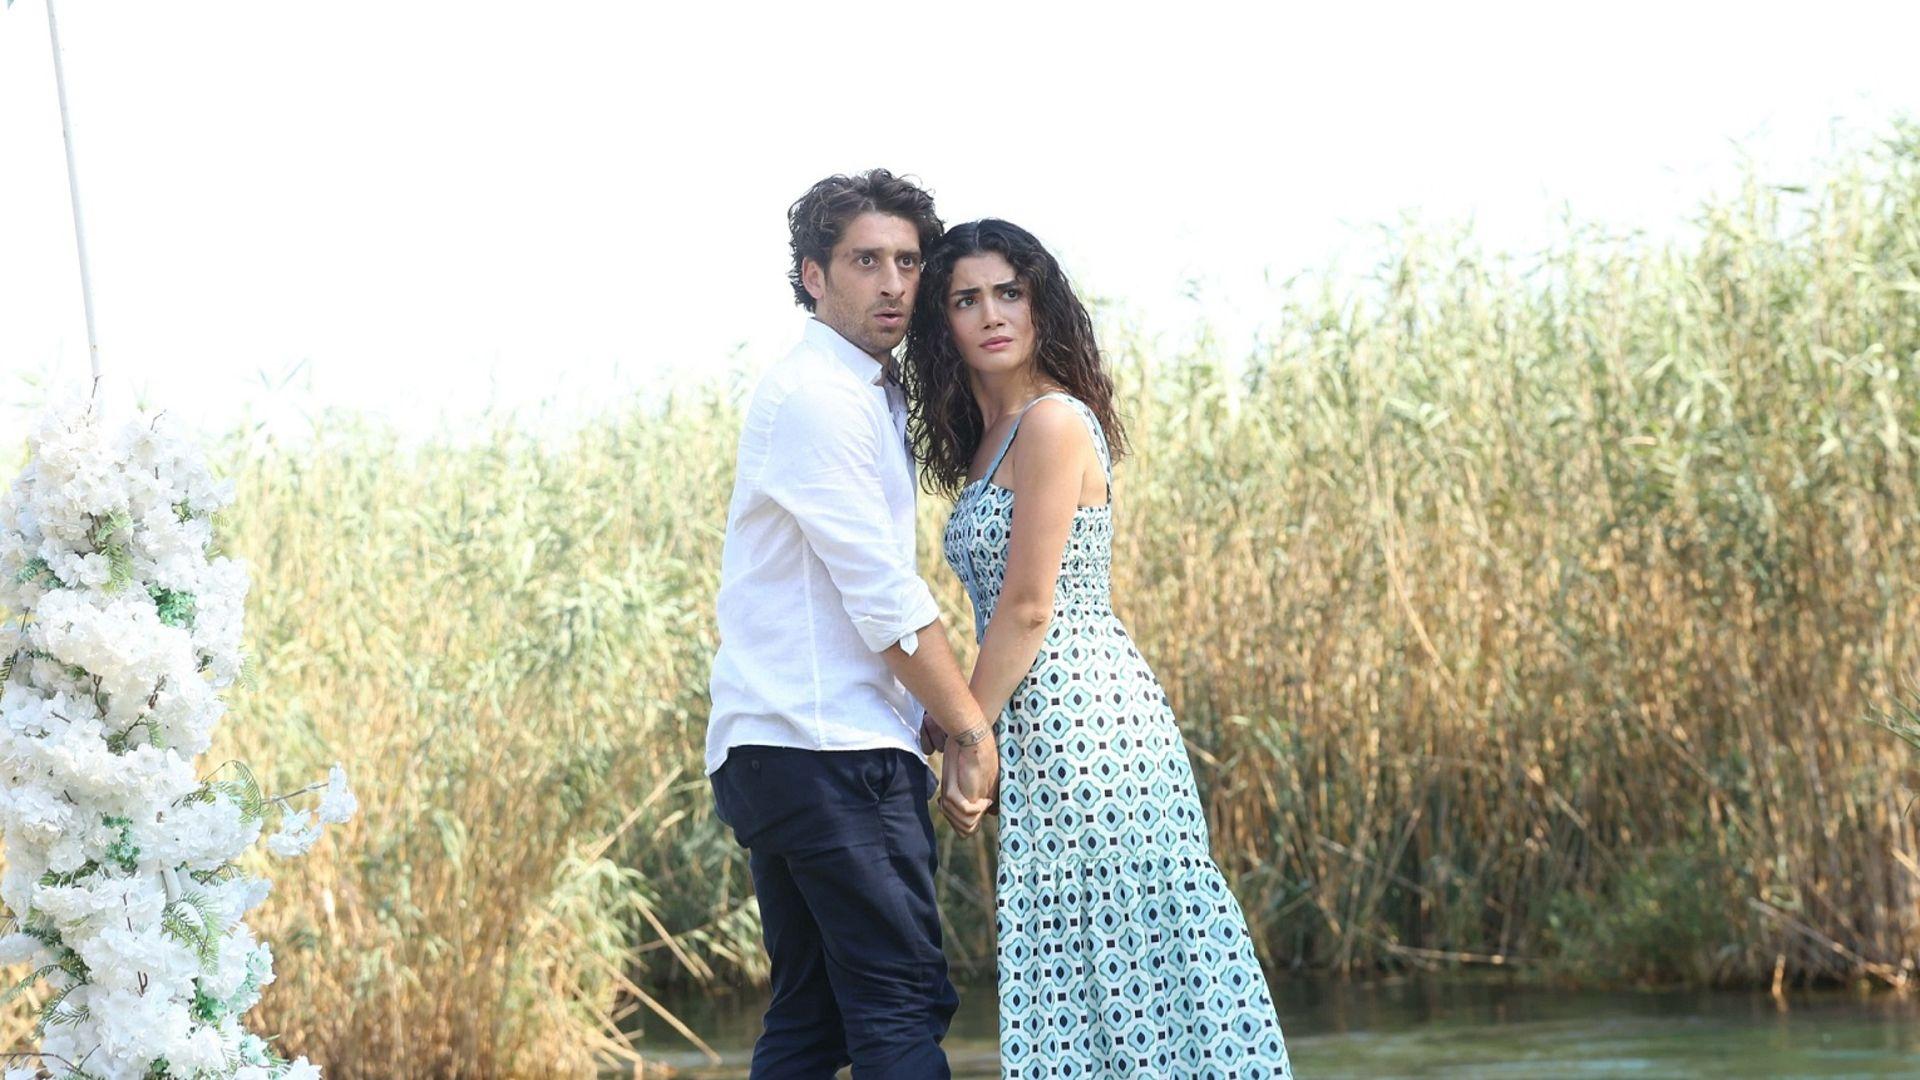 Ozge Yagiz stars as Havva (Eve) in Icimizden Biri (One of Us)